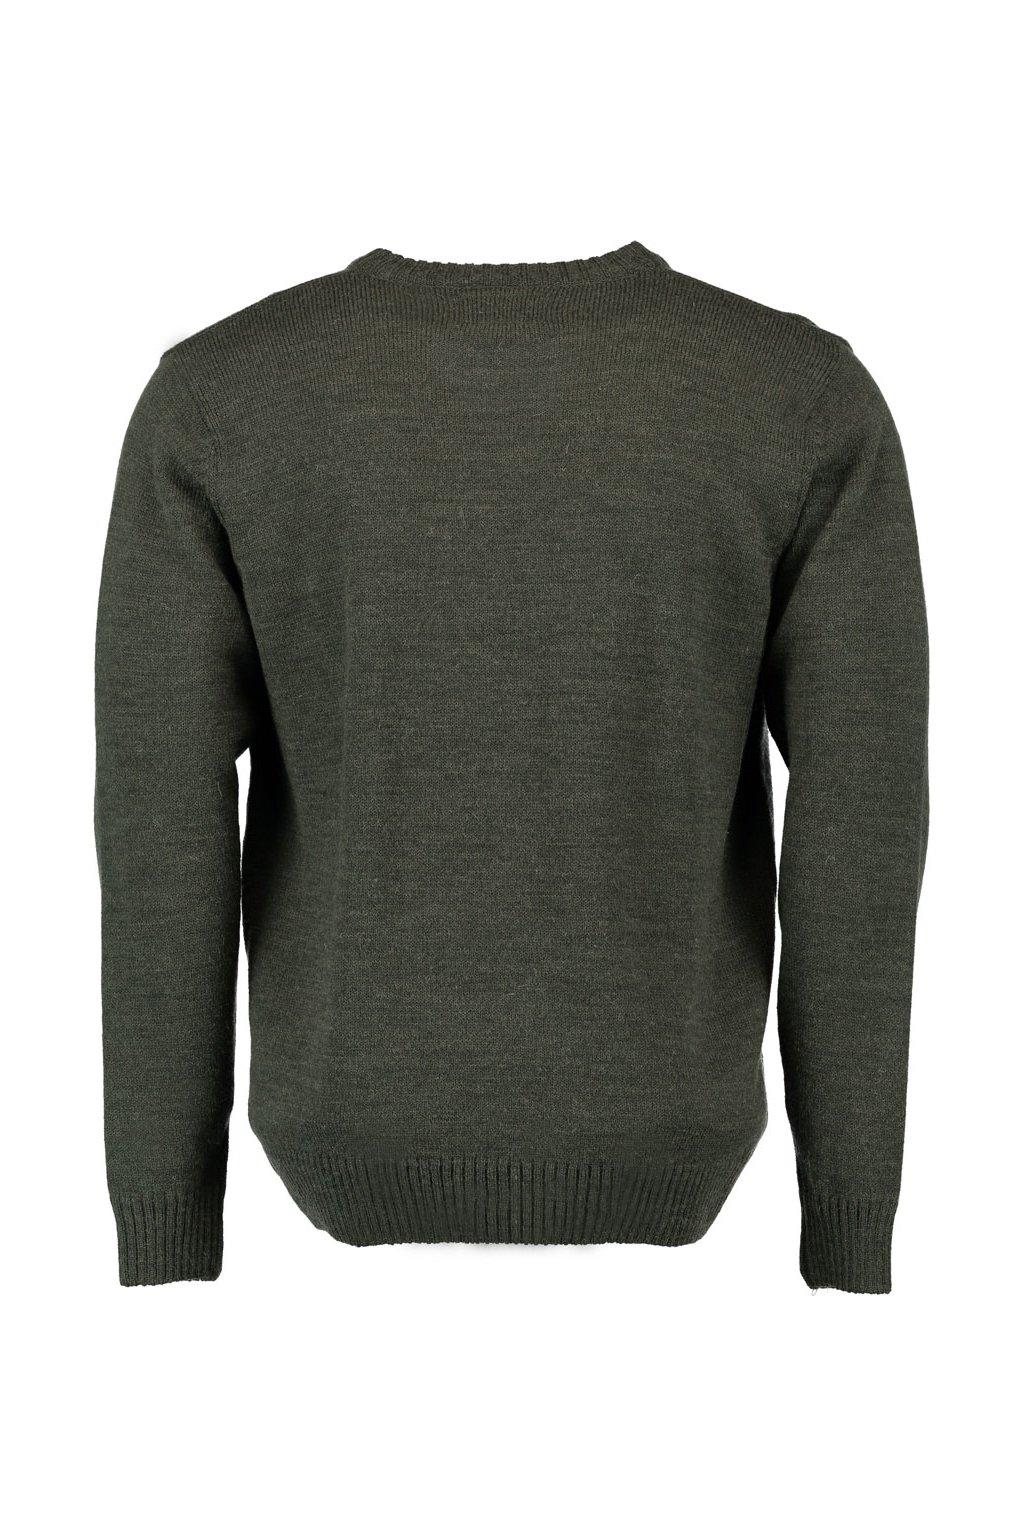 ORBIS - svetr pánský se srncem (7012)